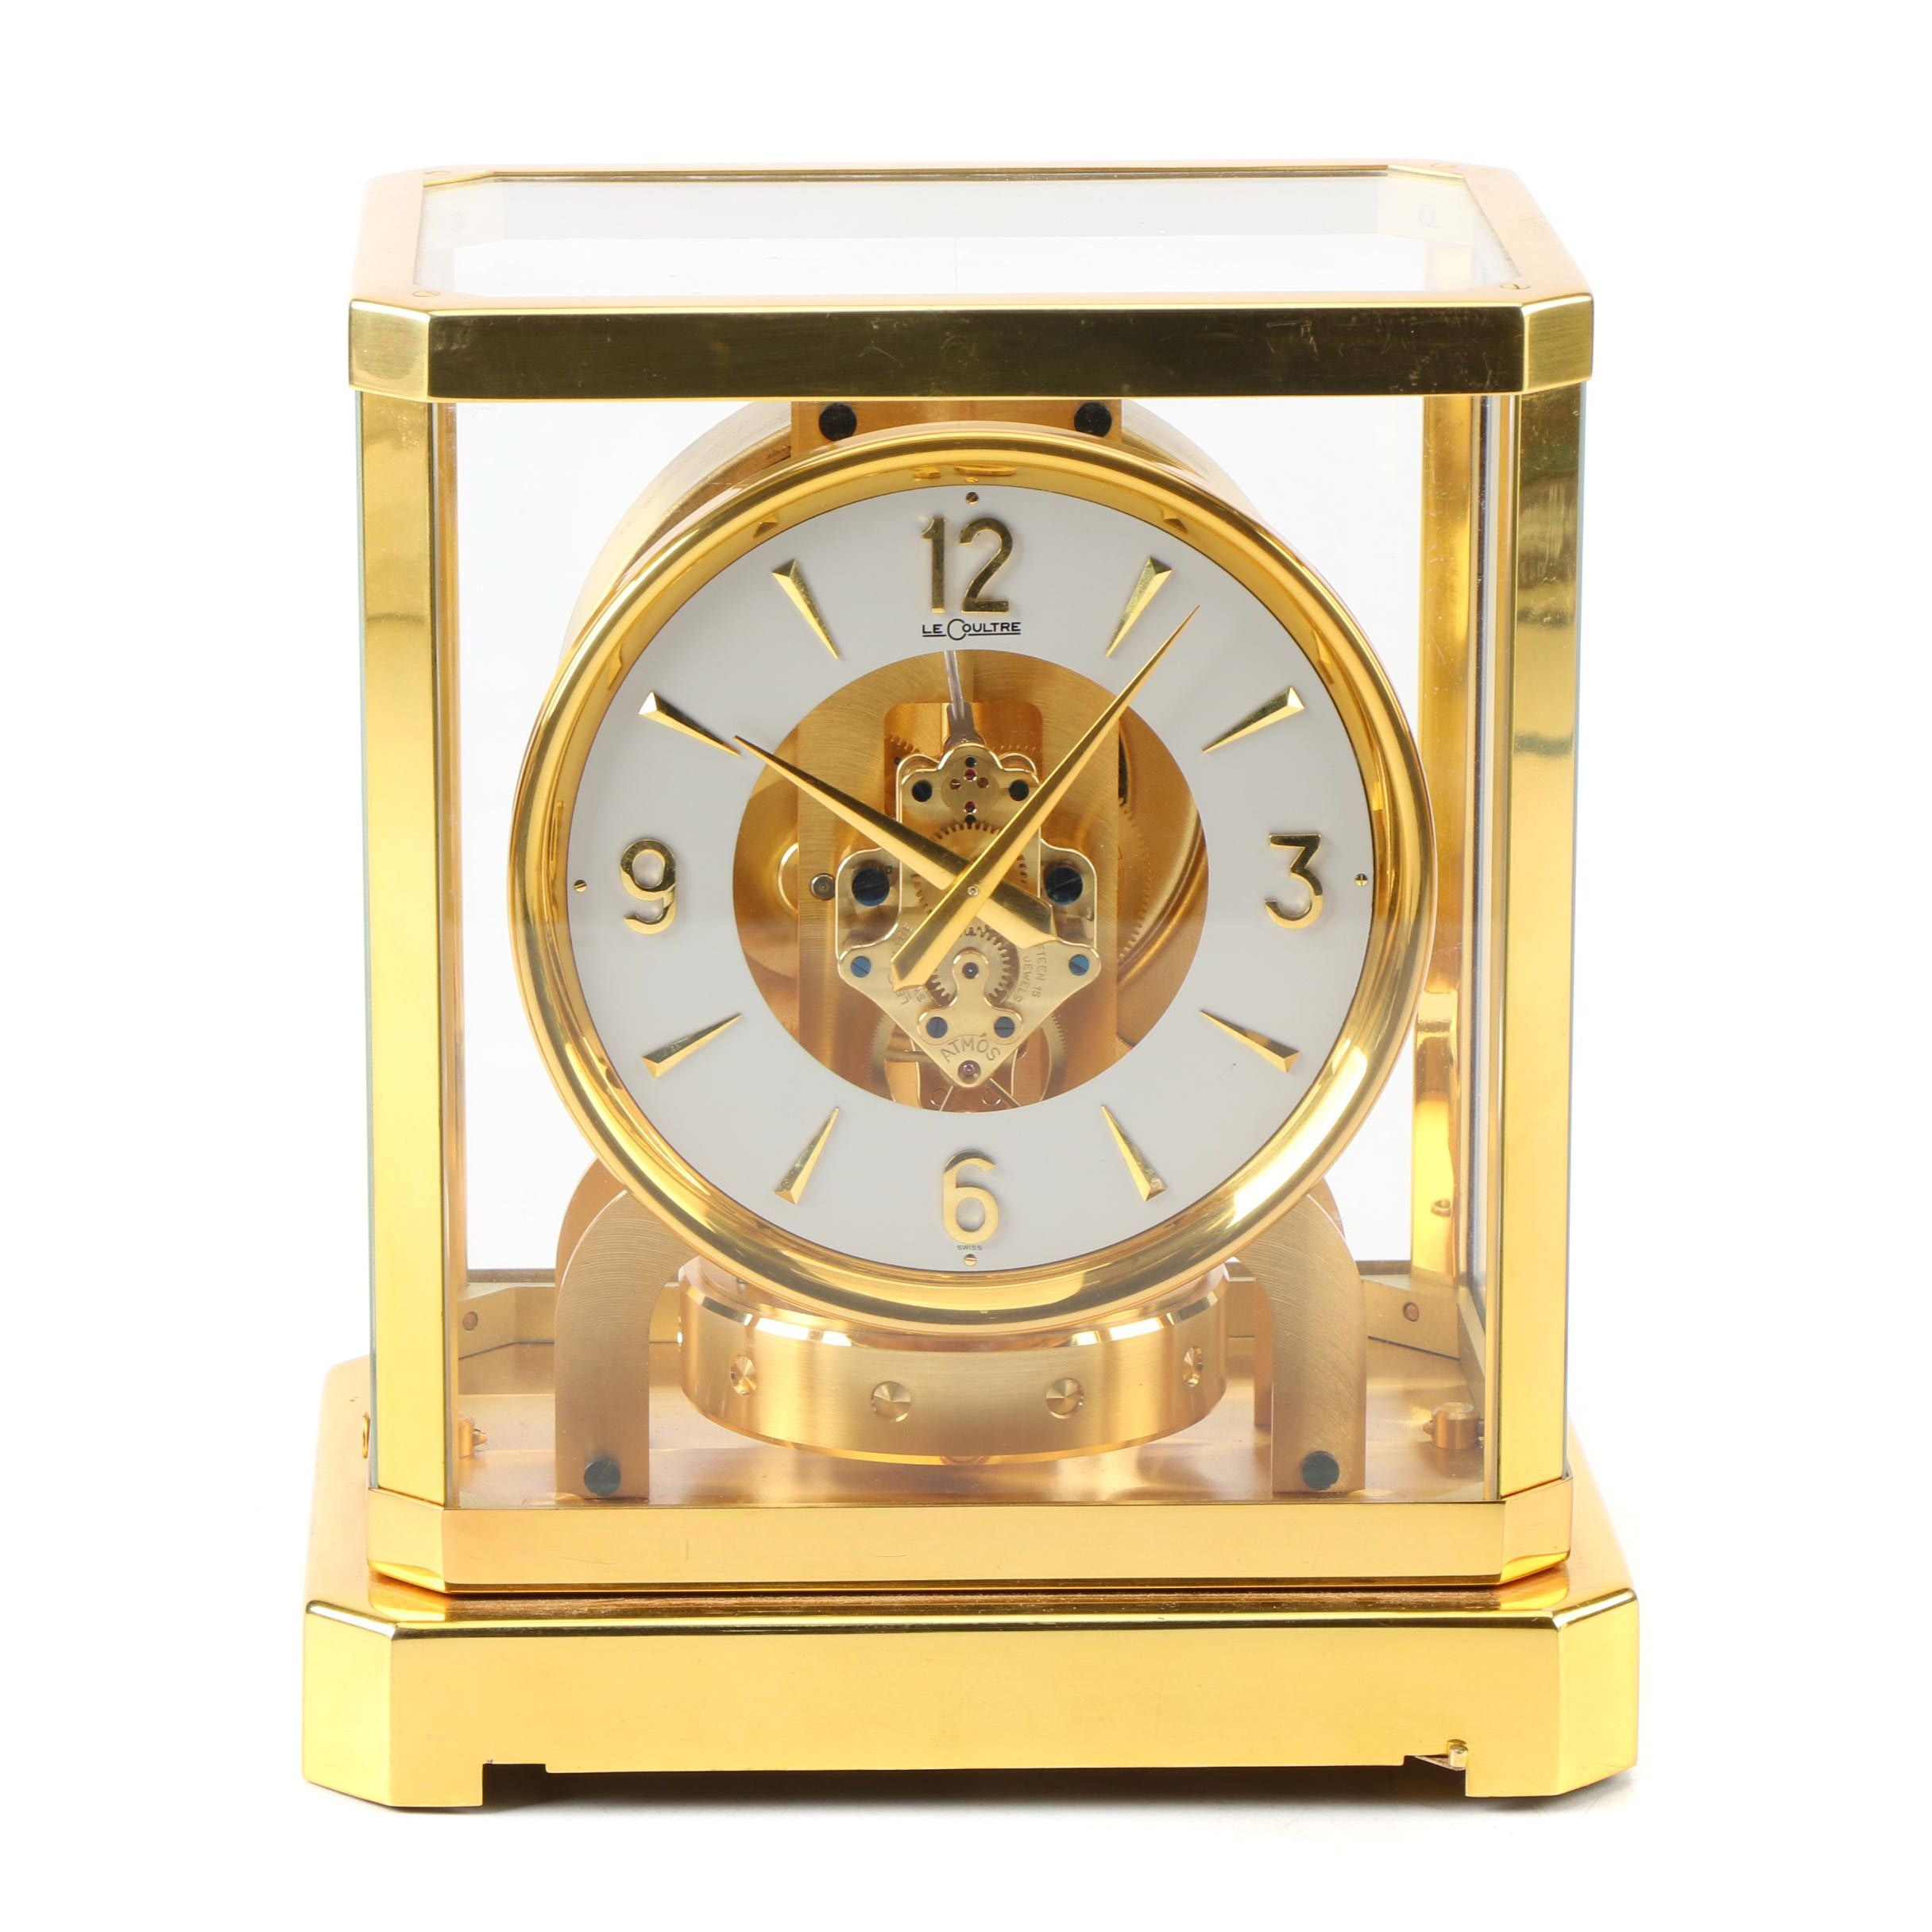 Jaeger-Lecoultre Gilt Brass and Glass Atmos Desk Clock